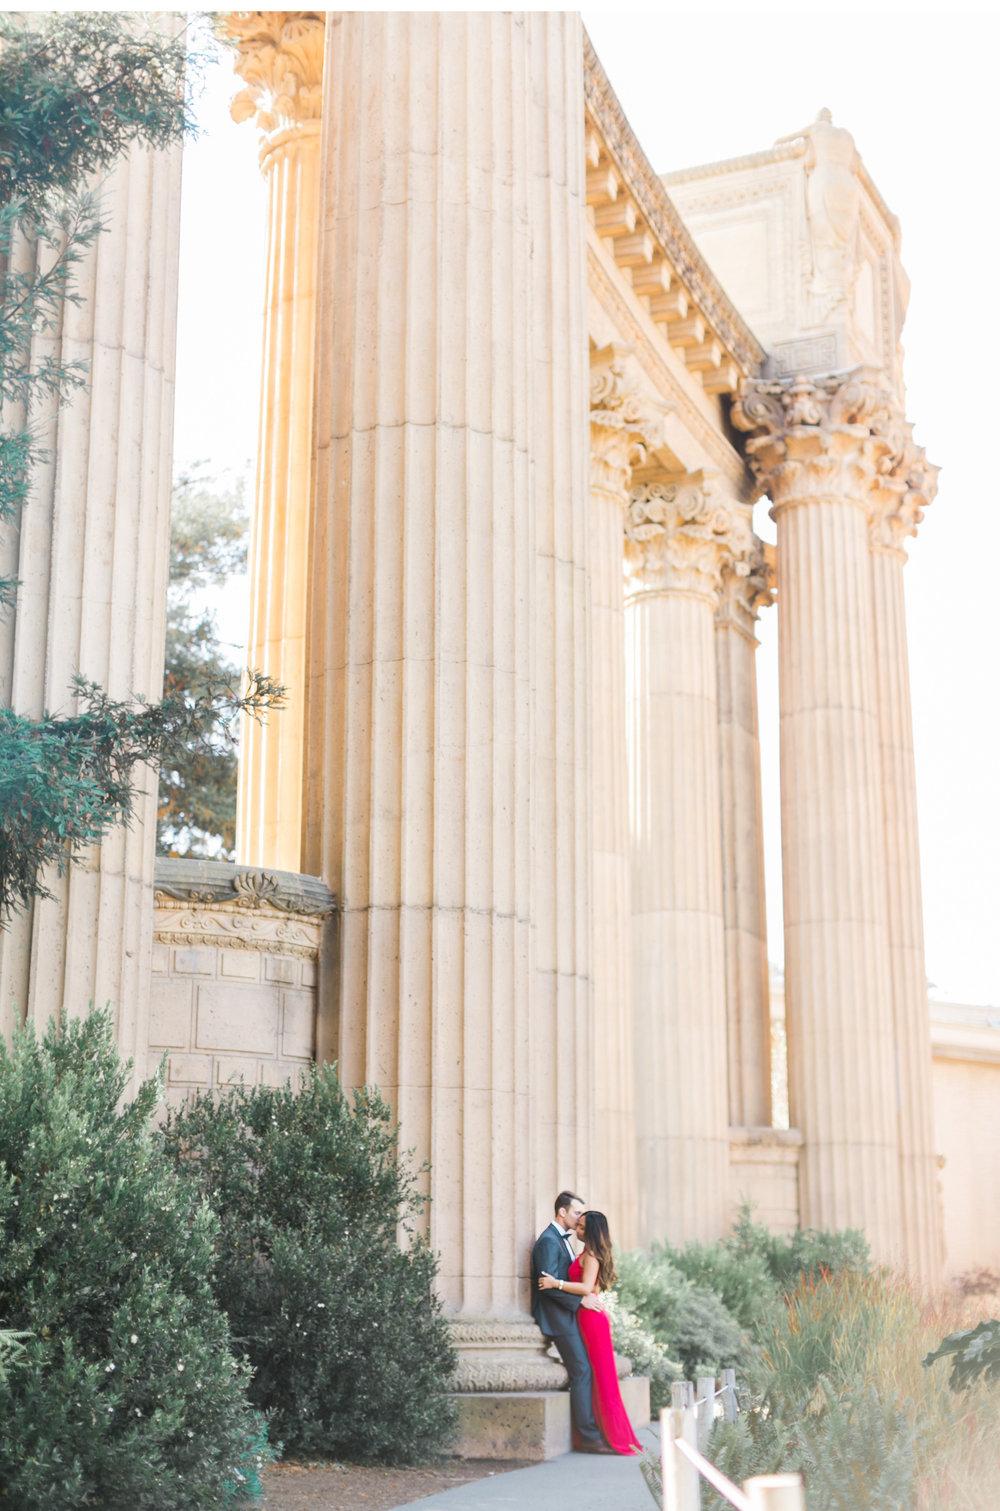 Malibu-Wedding-Photographer-Natalie-Schutt-Photography-Style-Me-Pretty_08.jpg